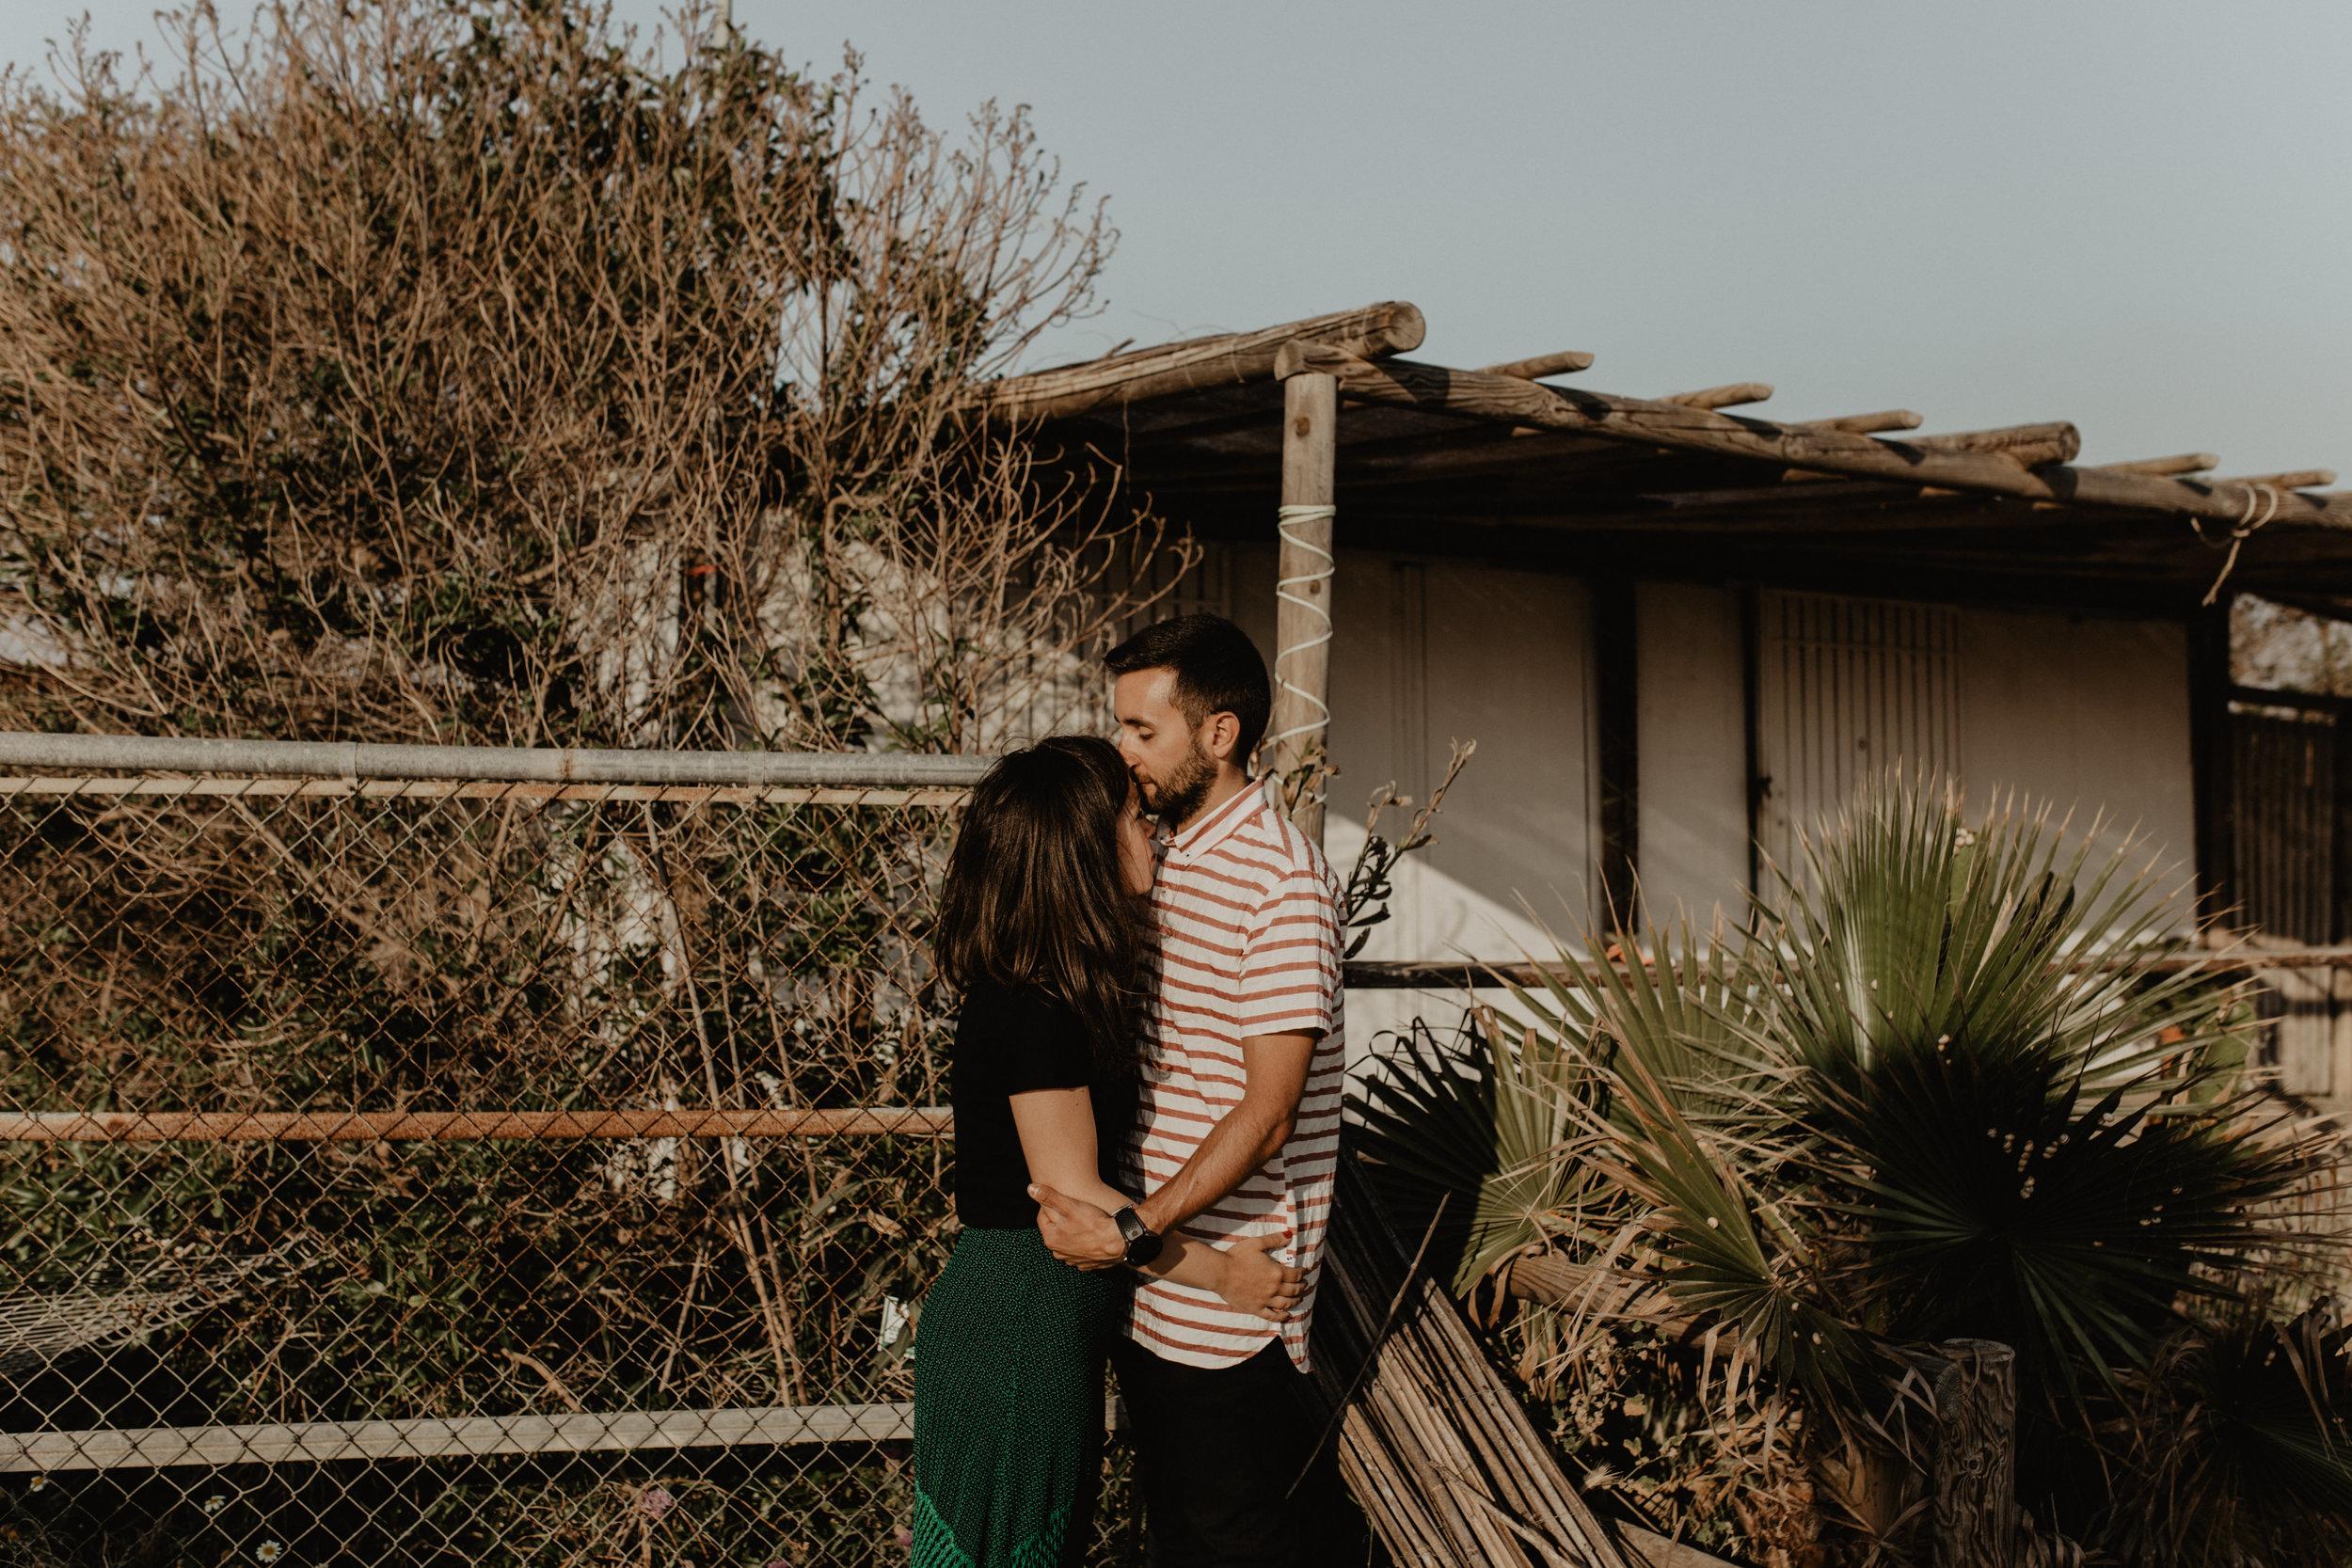 alt_thenortherngirlphotography_liverpool_couples_weddingphotographer_photographer_wedding_boda_fotografodebodas_fotografobodasbarcelona_bodaindie_bodasconestilo_elpalmar_beach_coupleinthebeach_elpalmarcadiz_elpalmarplaya_ananono-83.jpg